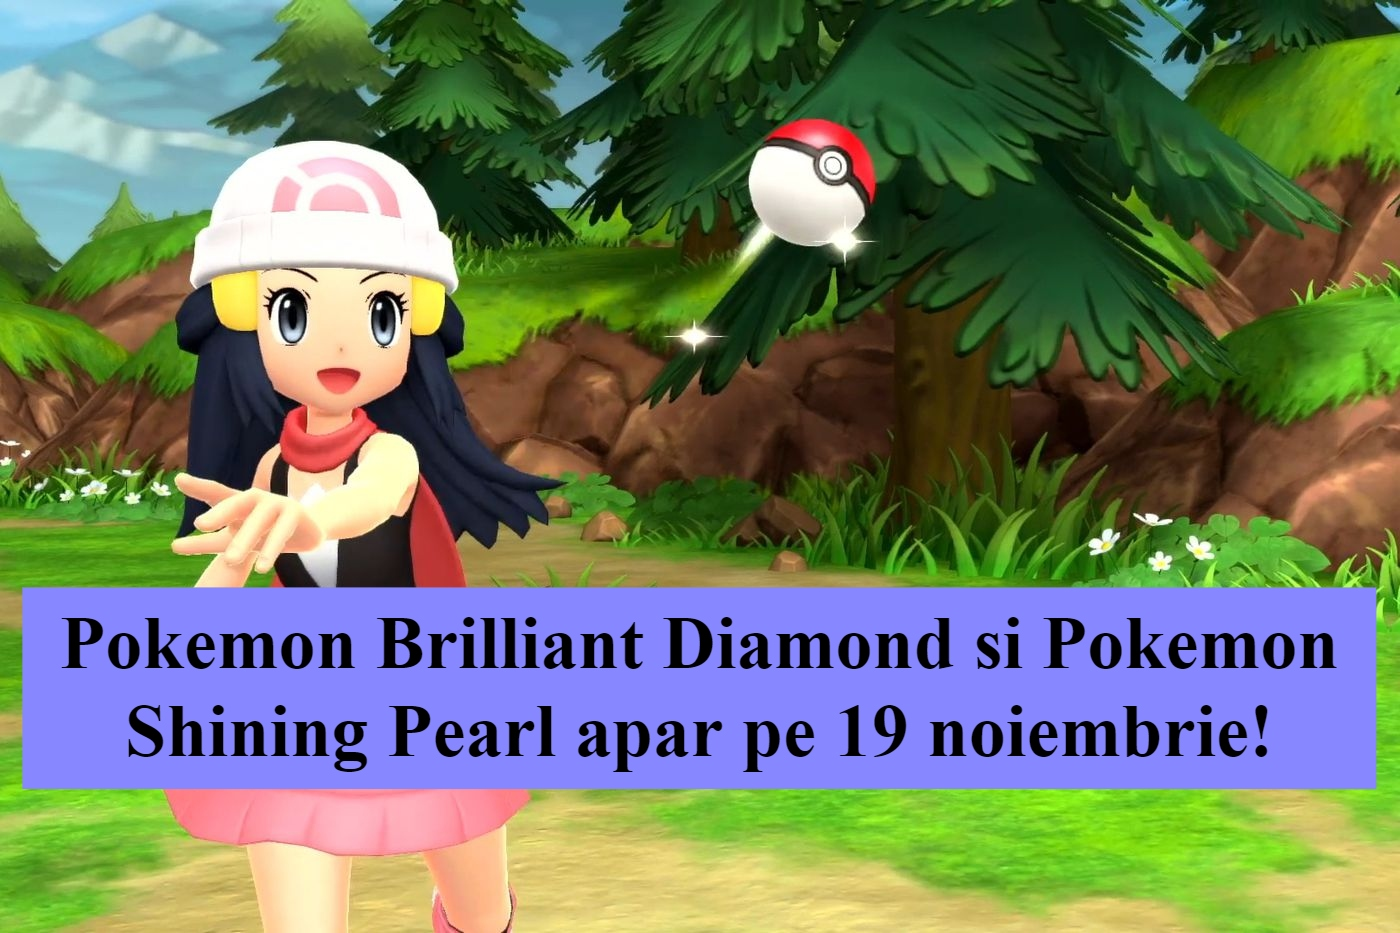 Pokemon Brilliant Diamond si Pokemon Shining Pearl vin pe 19 noiembrie